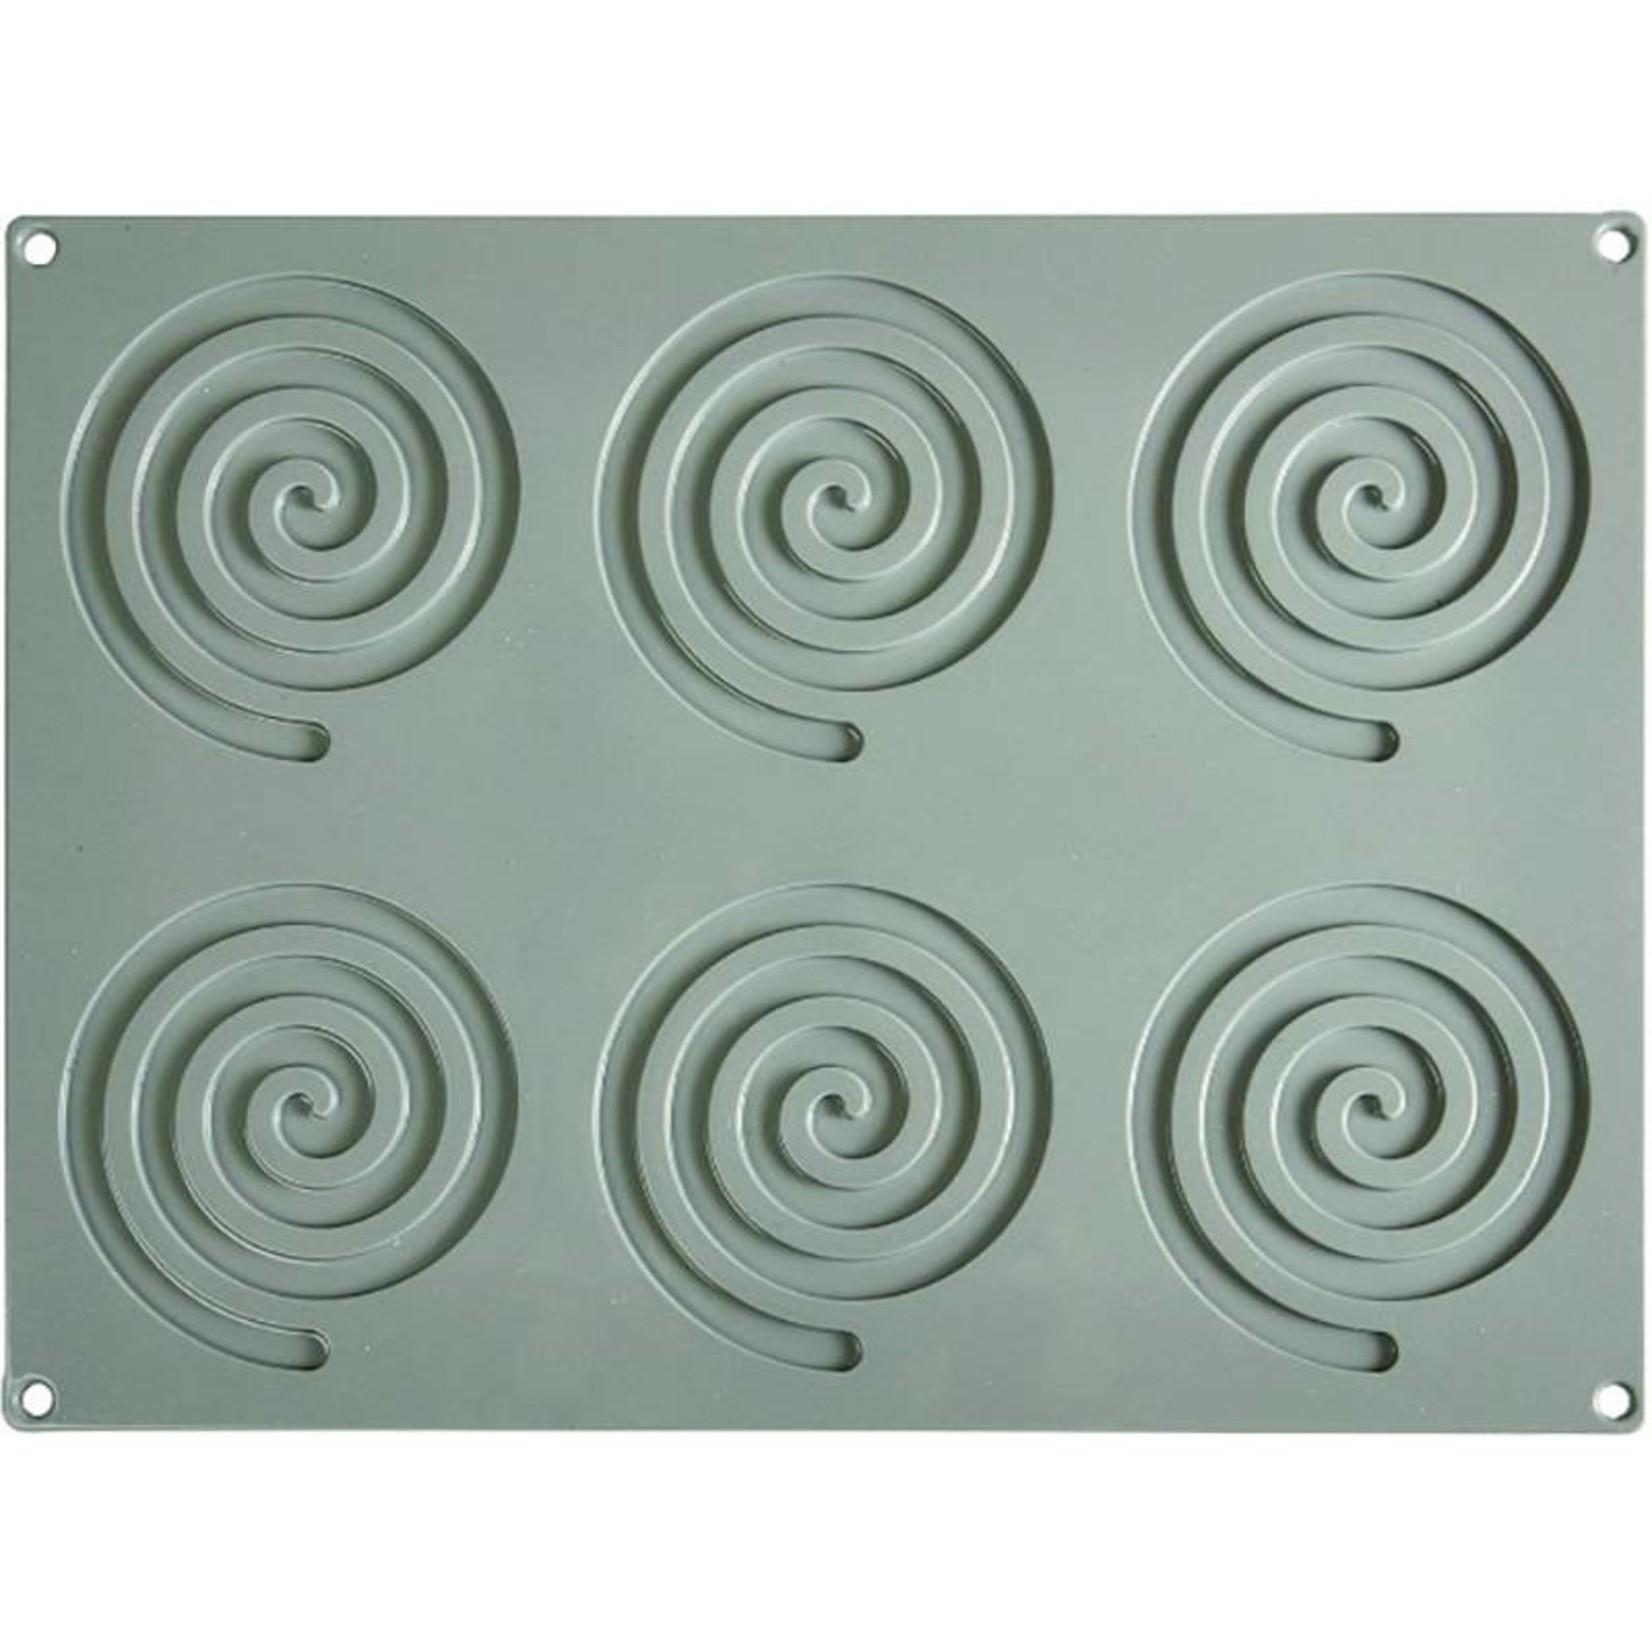 Pavoni Pavoni - Gourmand silicone mold, Spirale (6 cavity), GG005